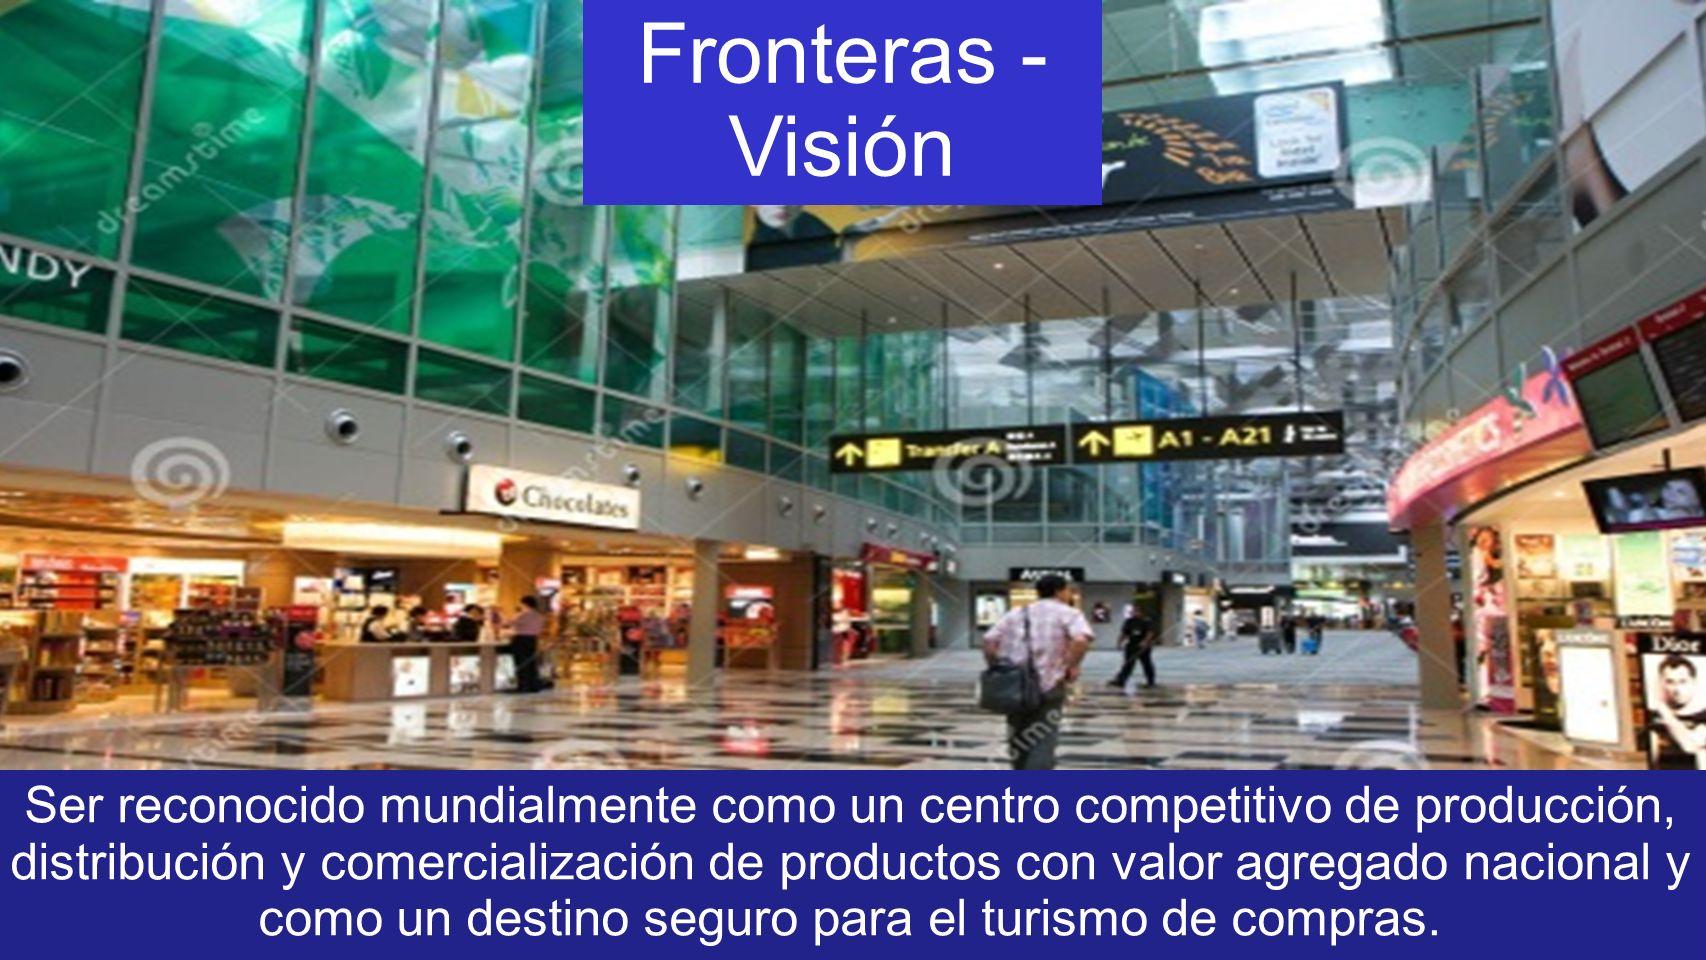 Fronteras - Visión Ser reconocido mundialmente como un centro competitivo de producción, distribución y comercialización de productos con valor agrega